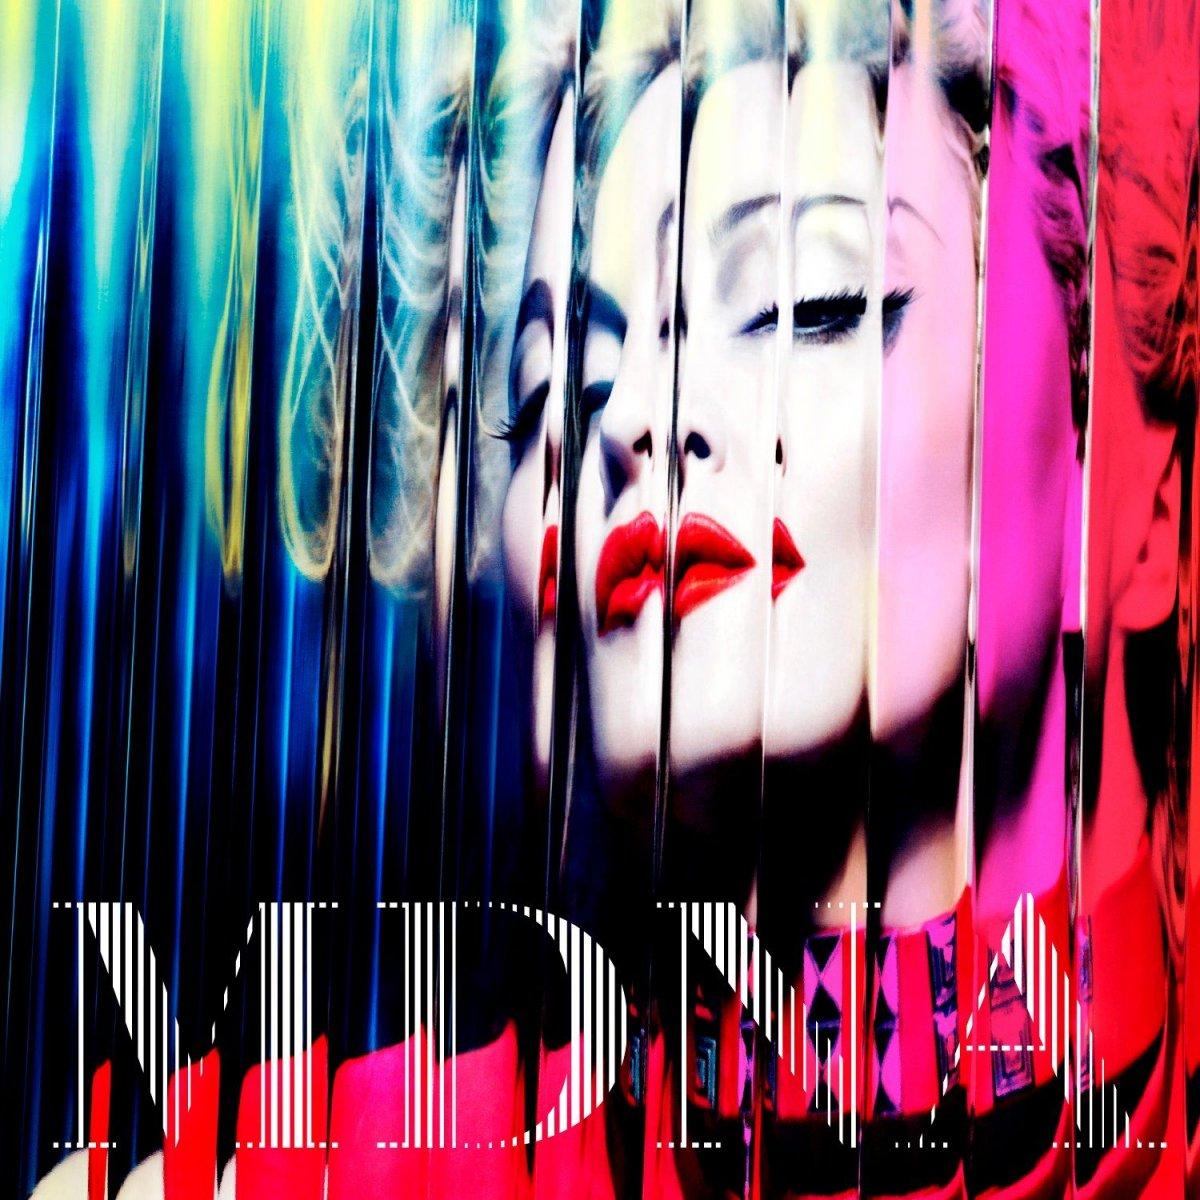 Madonna's concerts have made for than 1 billion dollars. Details at JasonSantoro.com